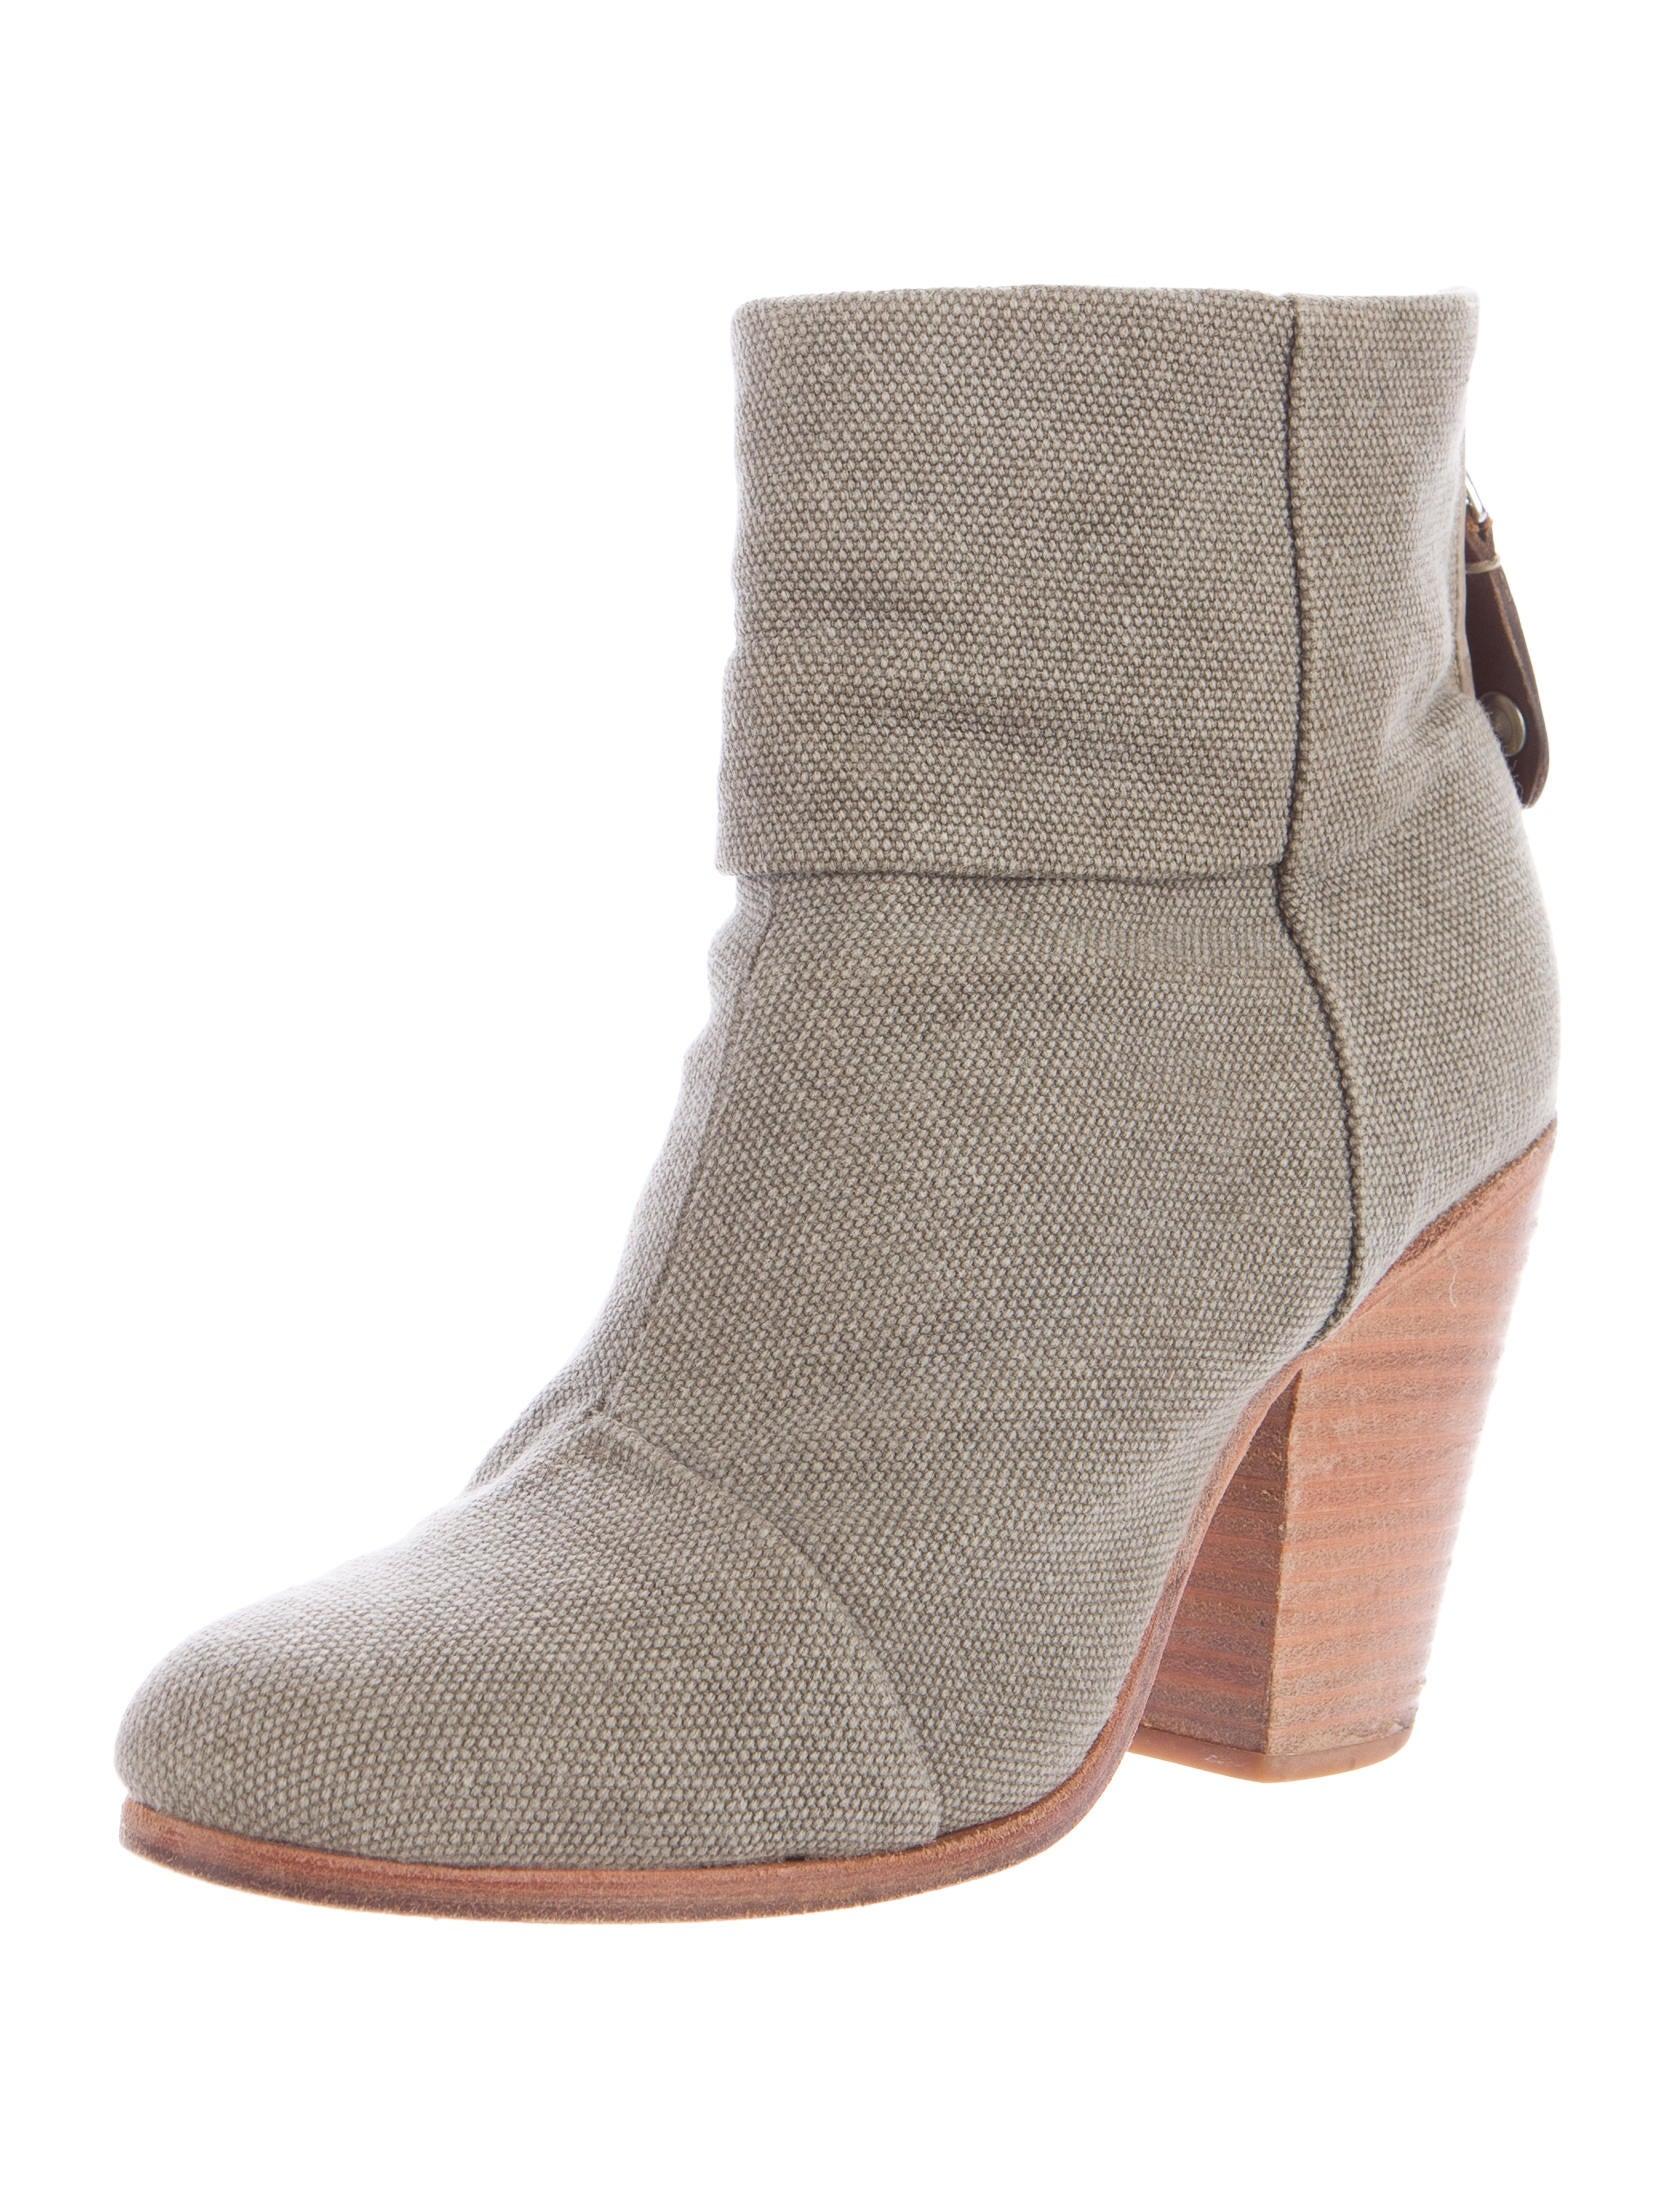 rag bone canvas newbury ankle boots shoes wragb70048